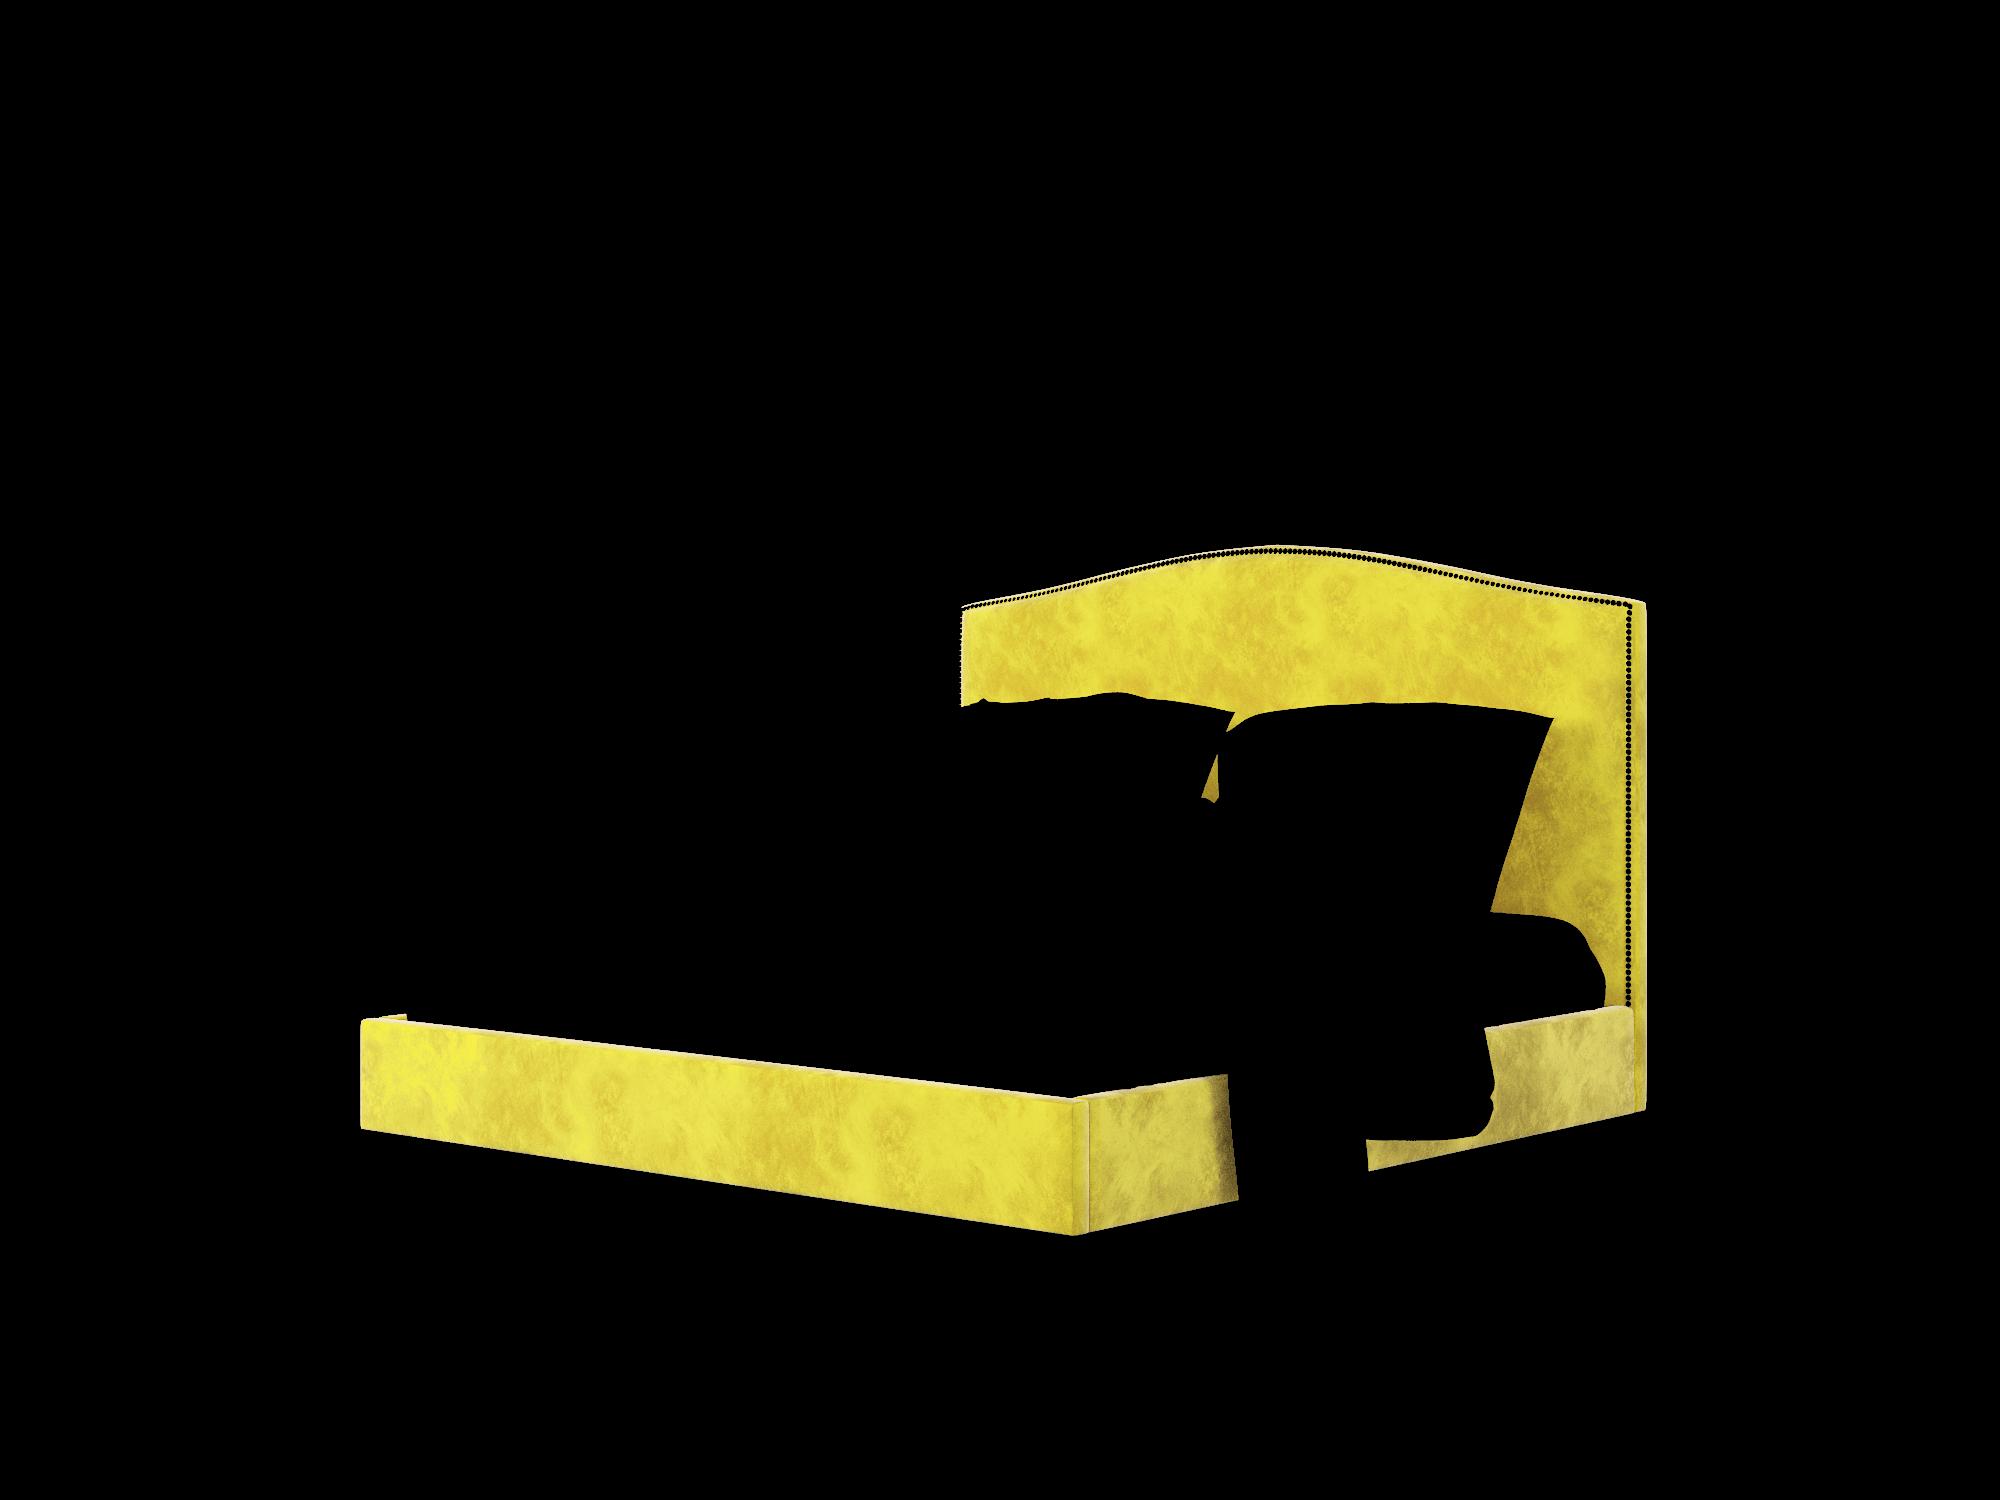 Dalion Quartz 402 Bed King Room Texture